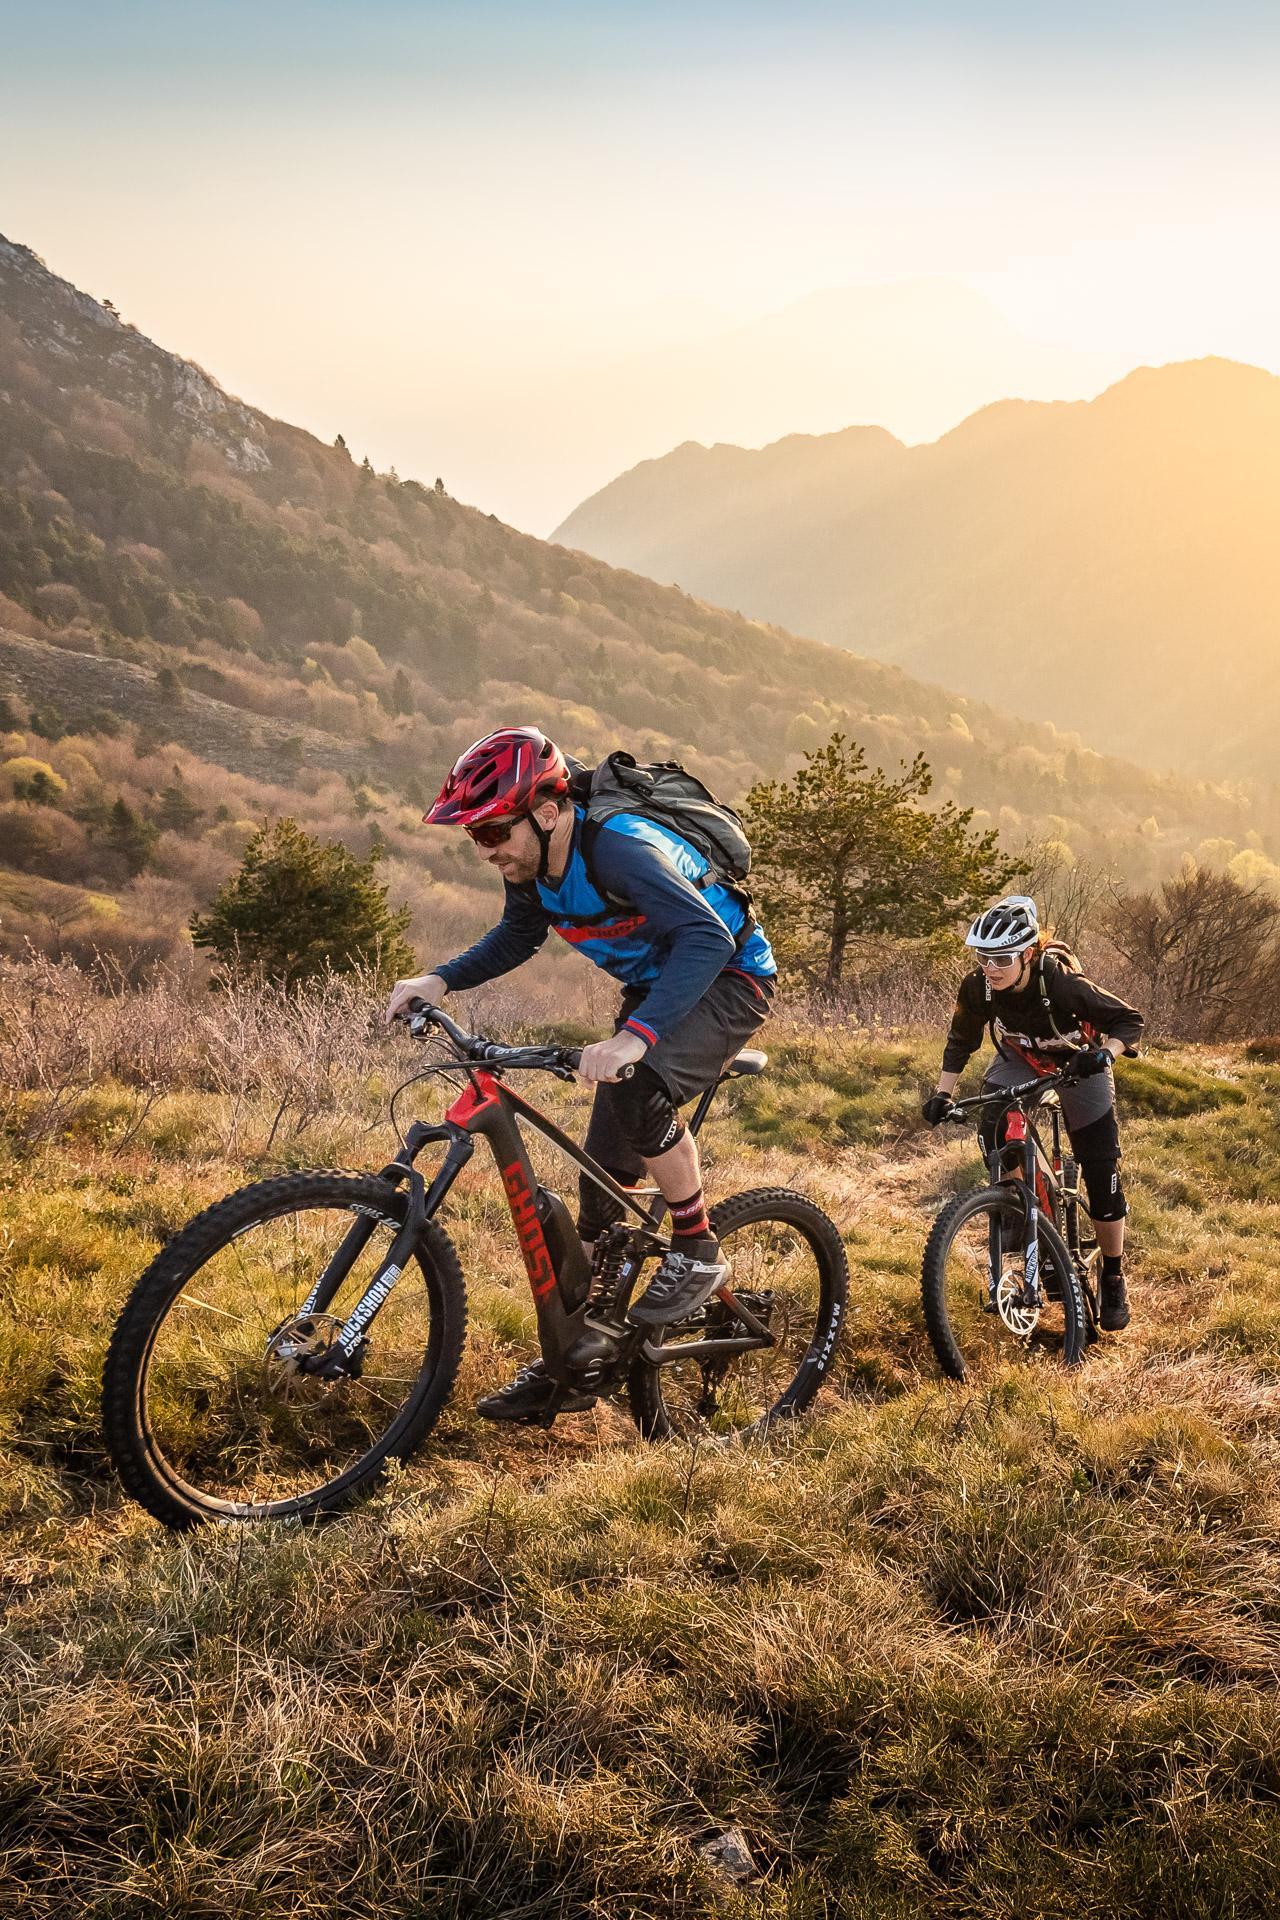 GHOST-Bikes-Hybride-Slamrx-Lago-di-Garda-2018-_MG_2138